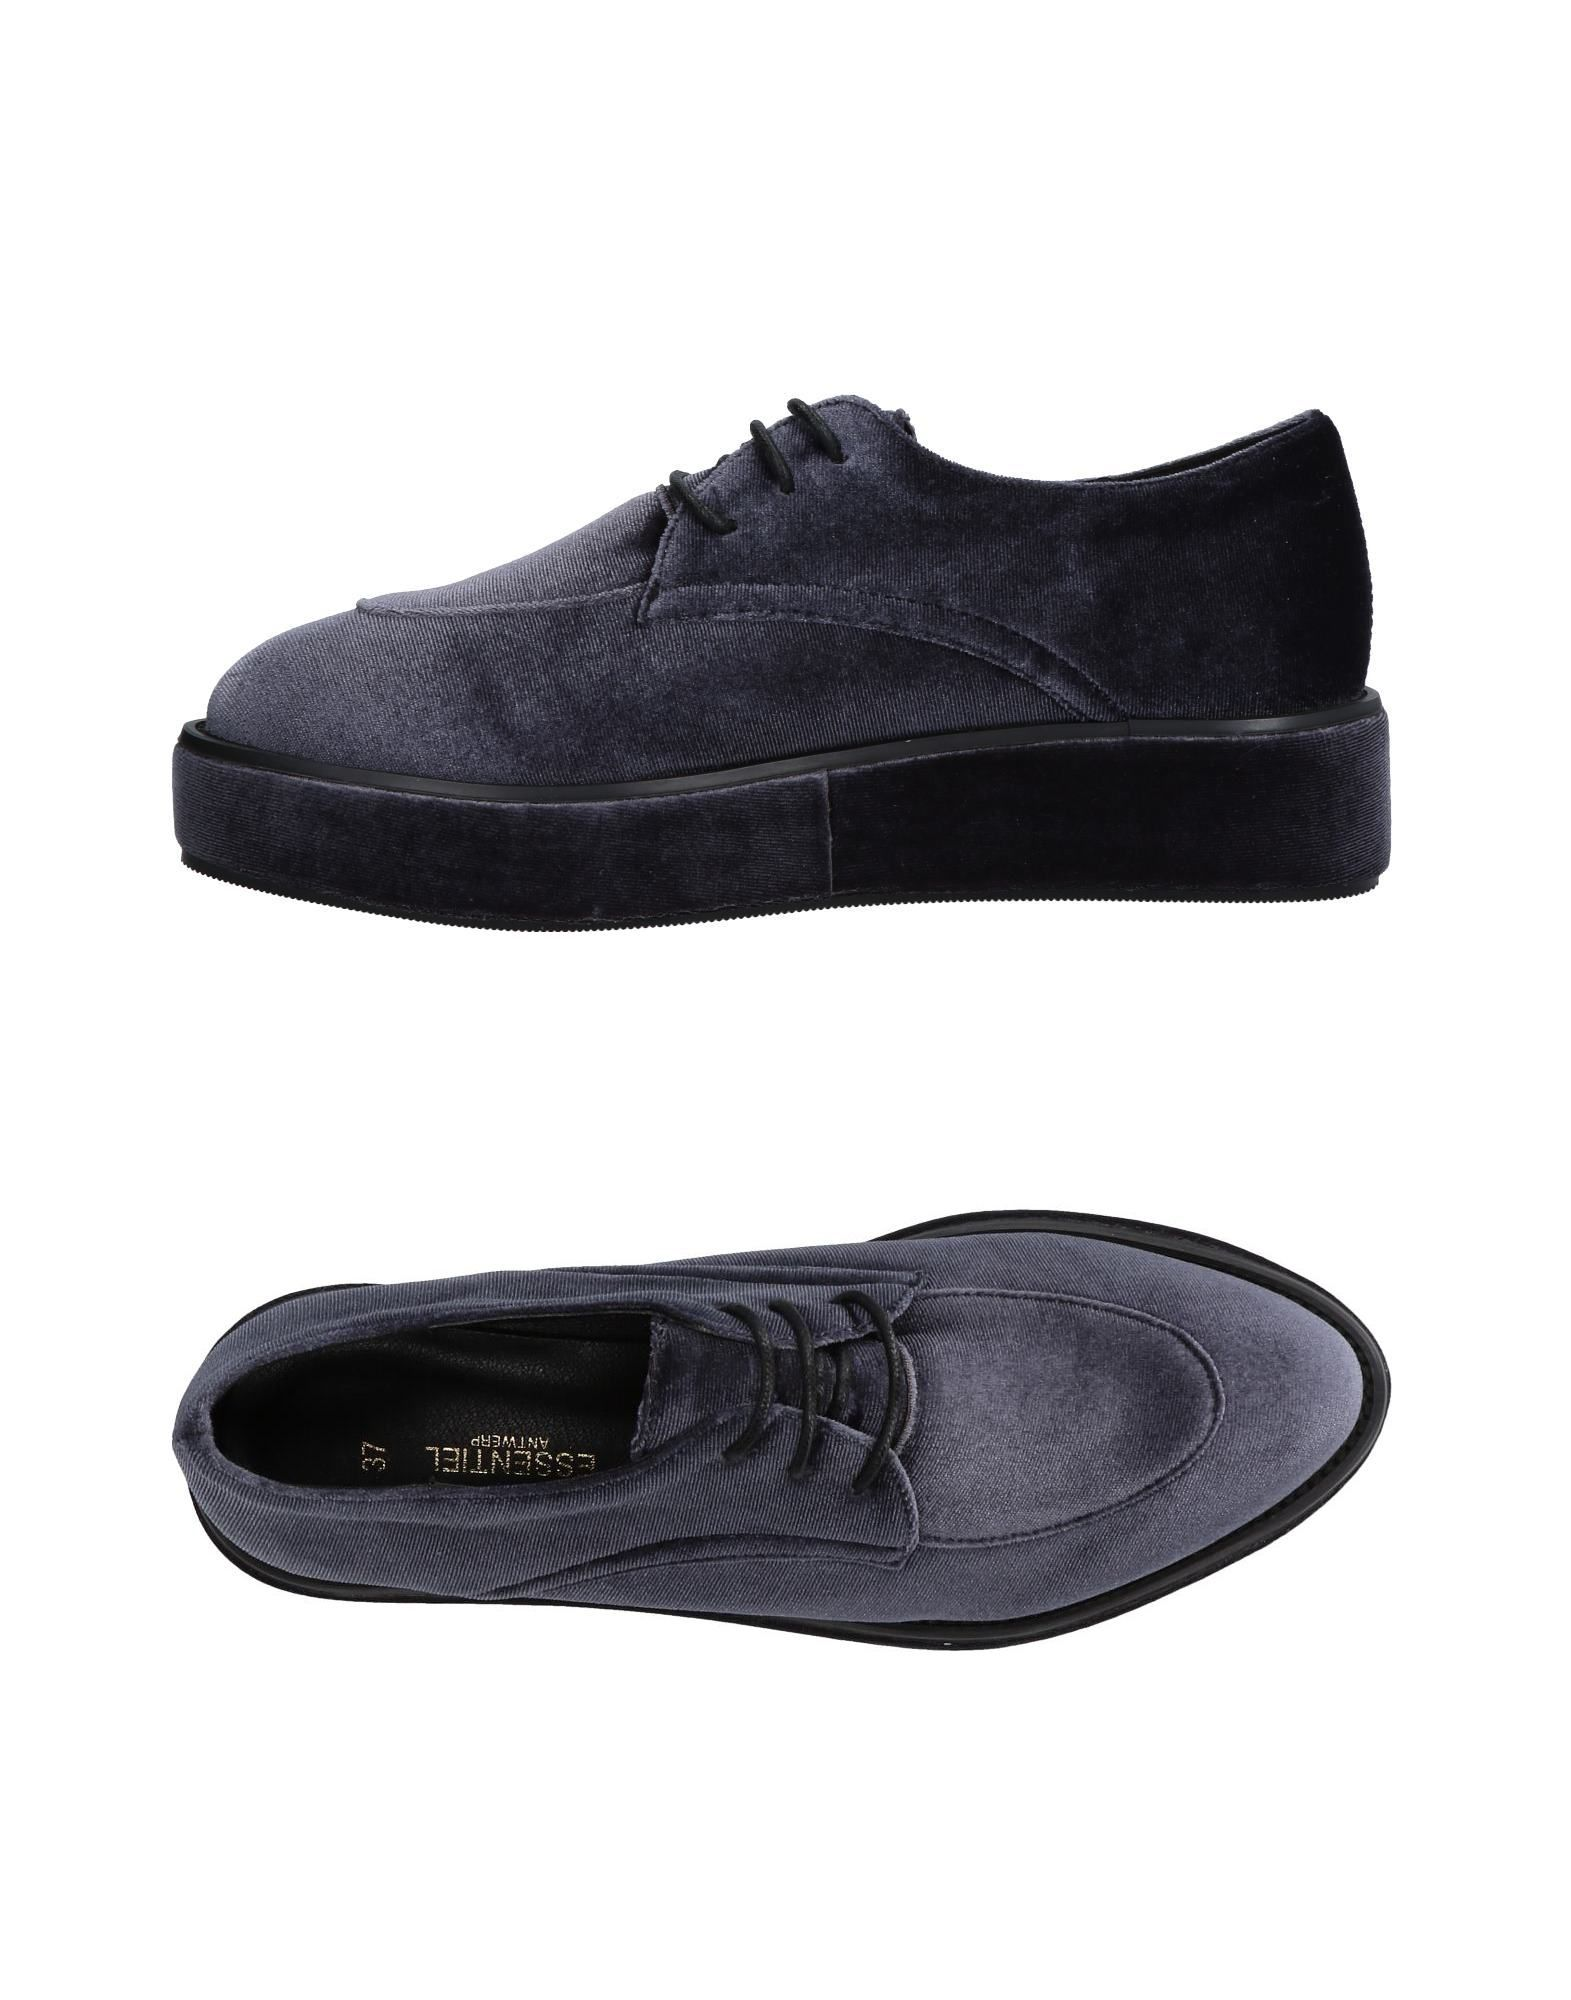 ESSENTIEL ANTWERP Обувь на шнурках цены онлайн